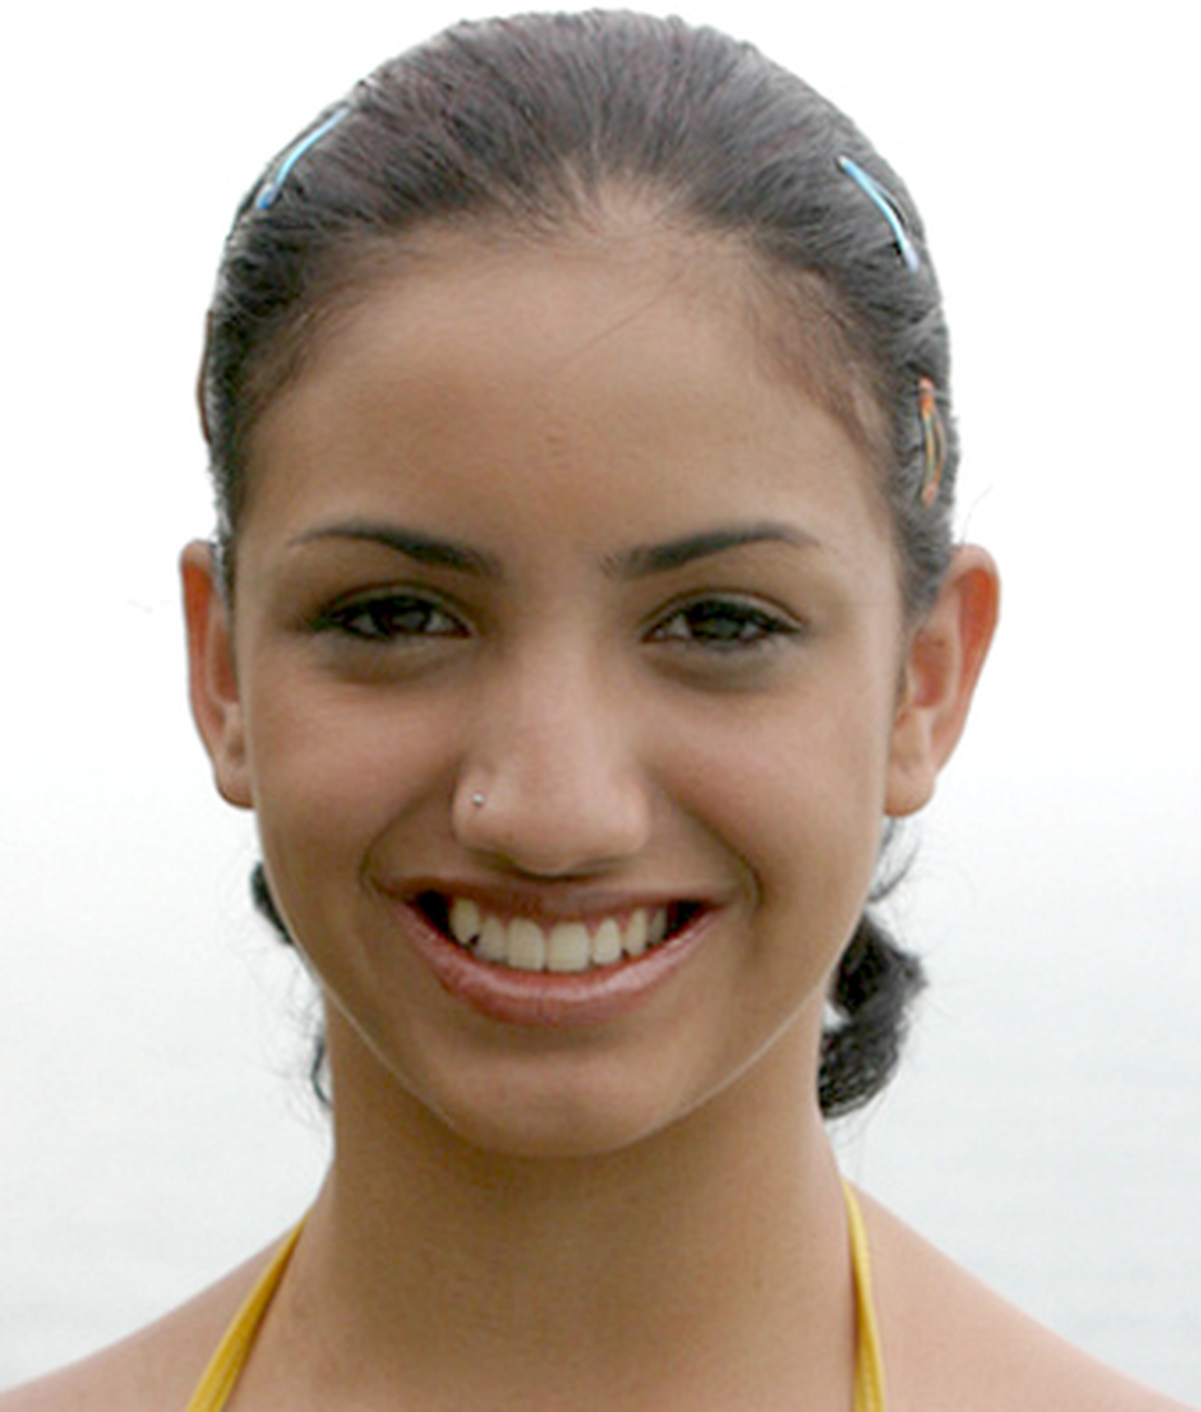 Rafaela Cristine